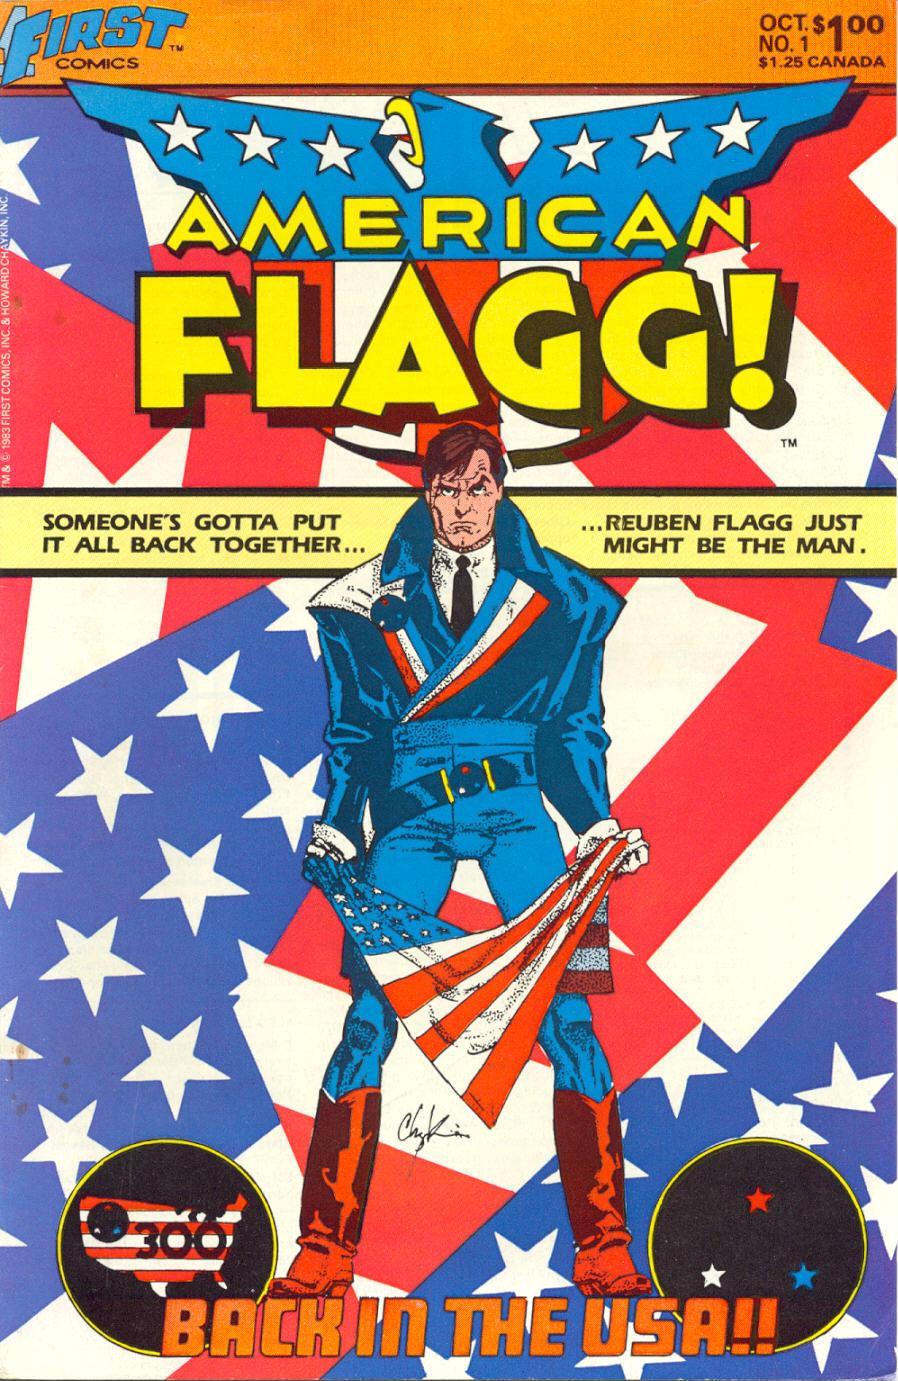 American Flagg (1983) #1 by Howard Chaykin.